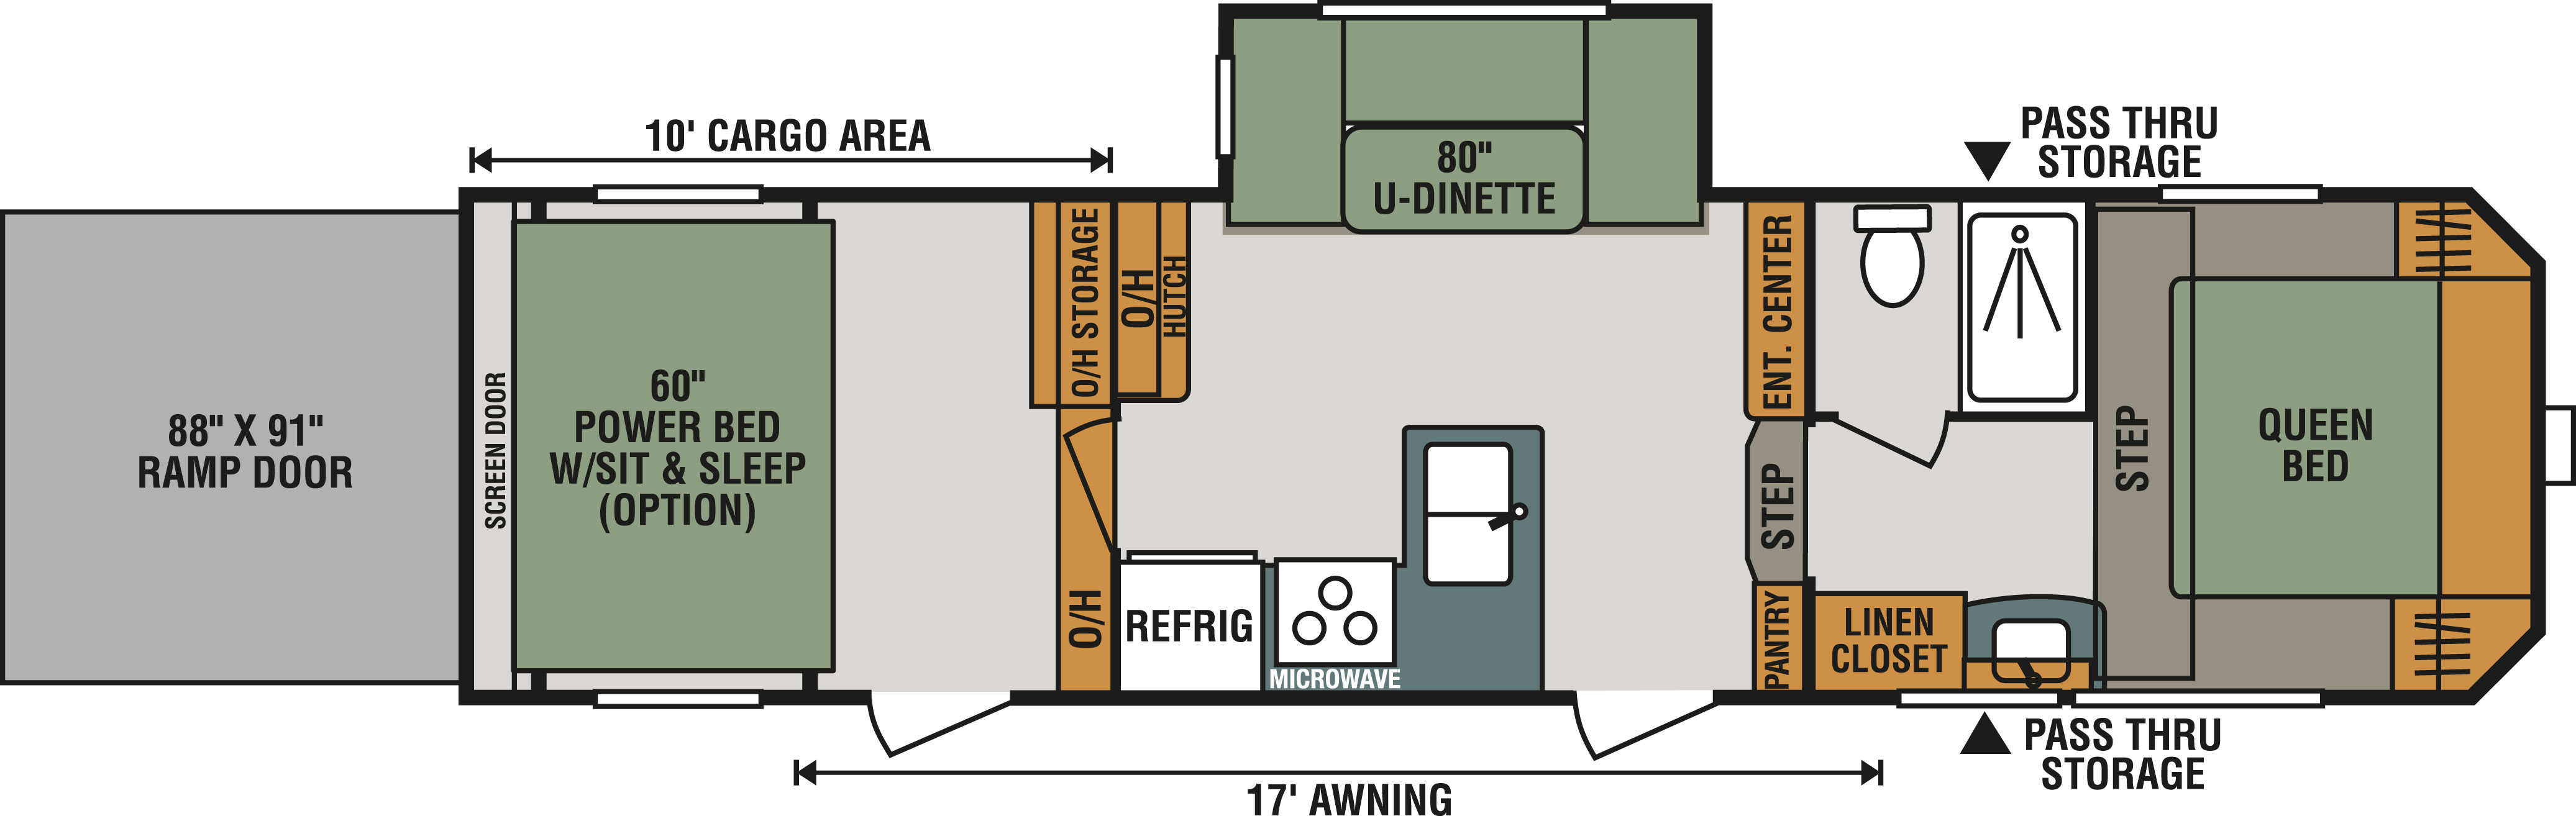 311TH10 Floorplan